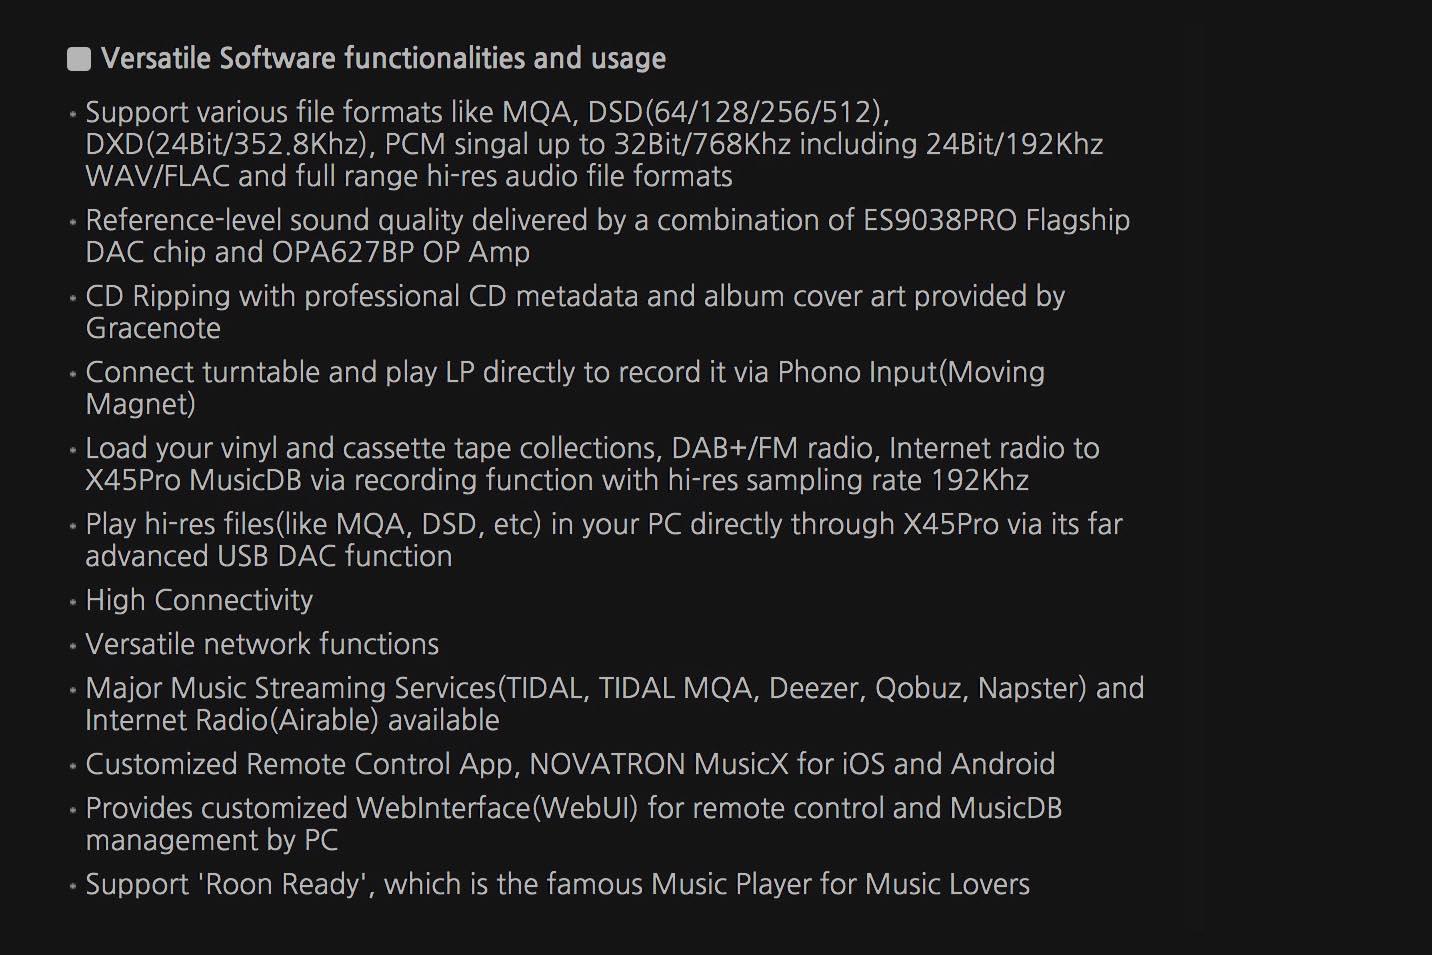 novafidelity-cocktail-audio-x45pro-functions.jpeg